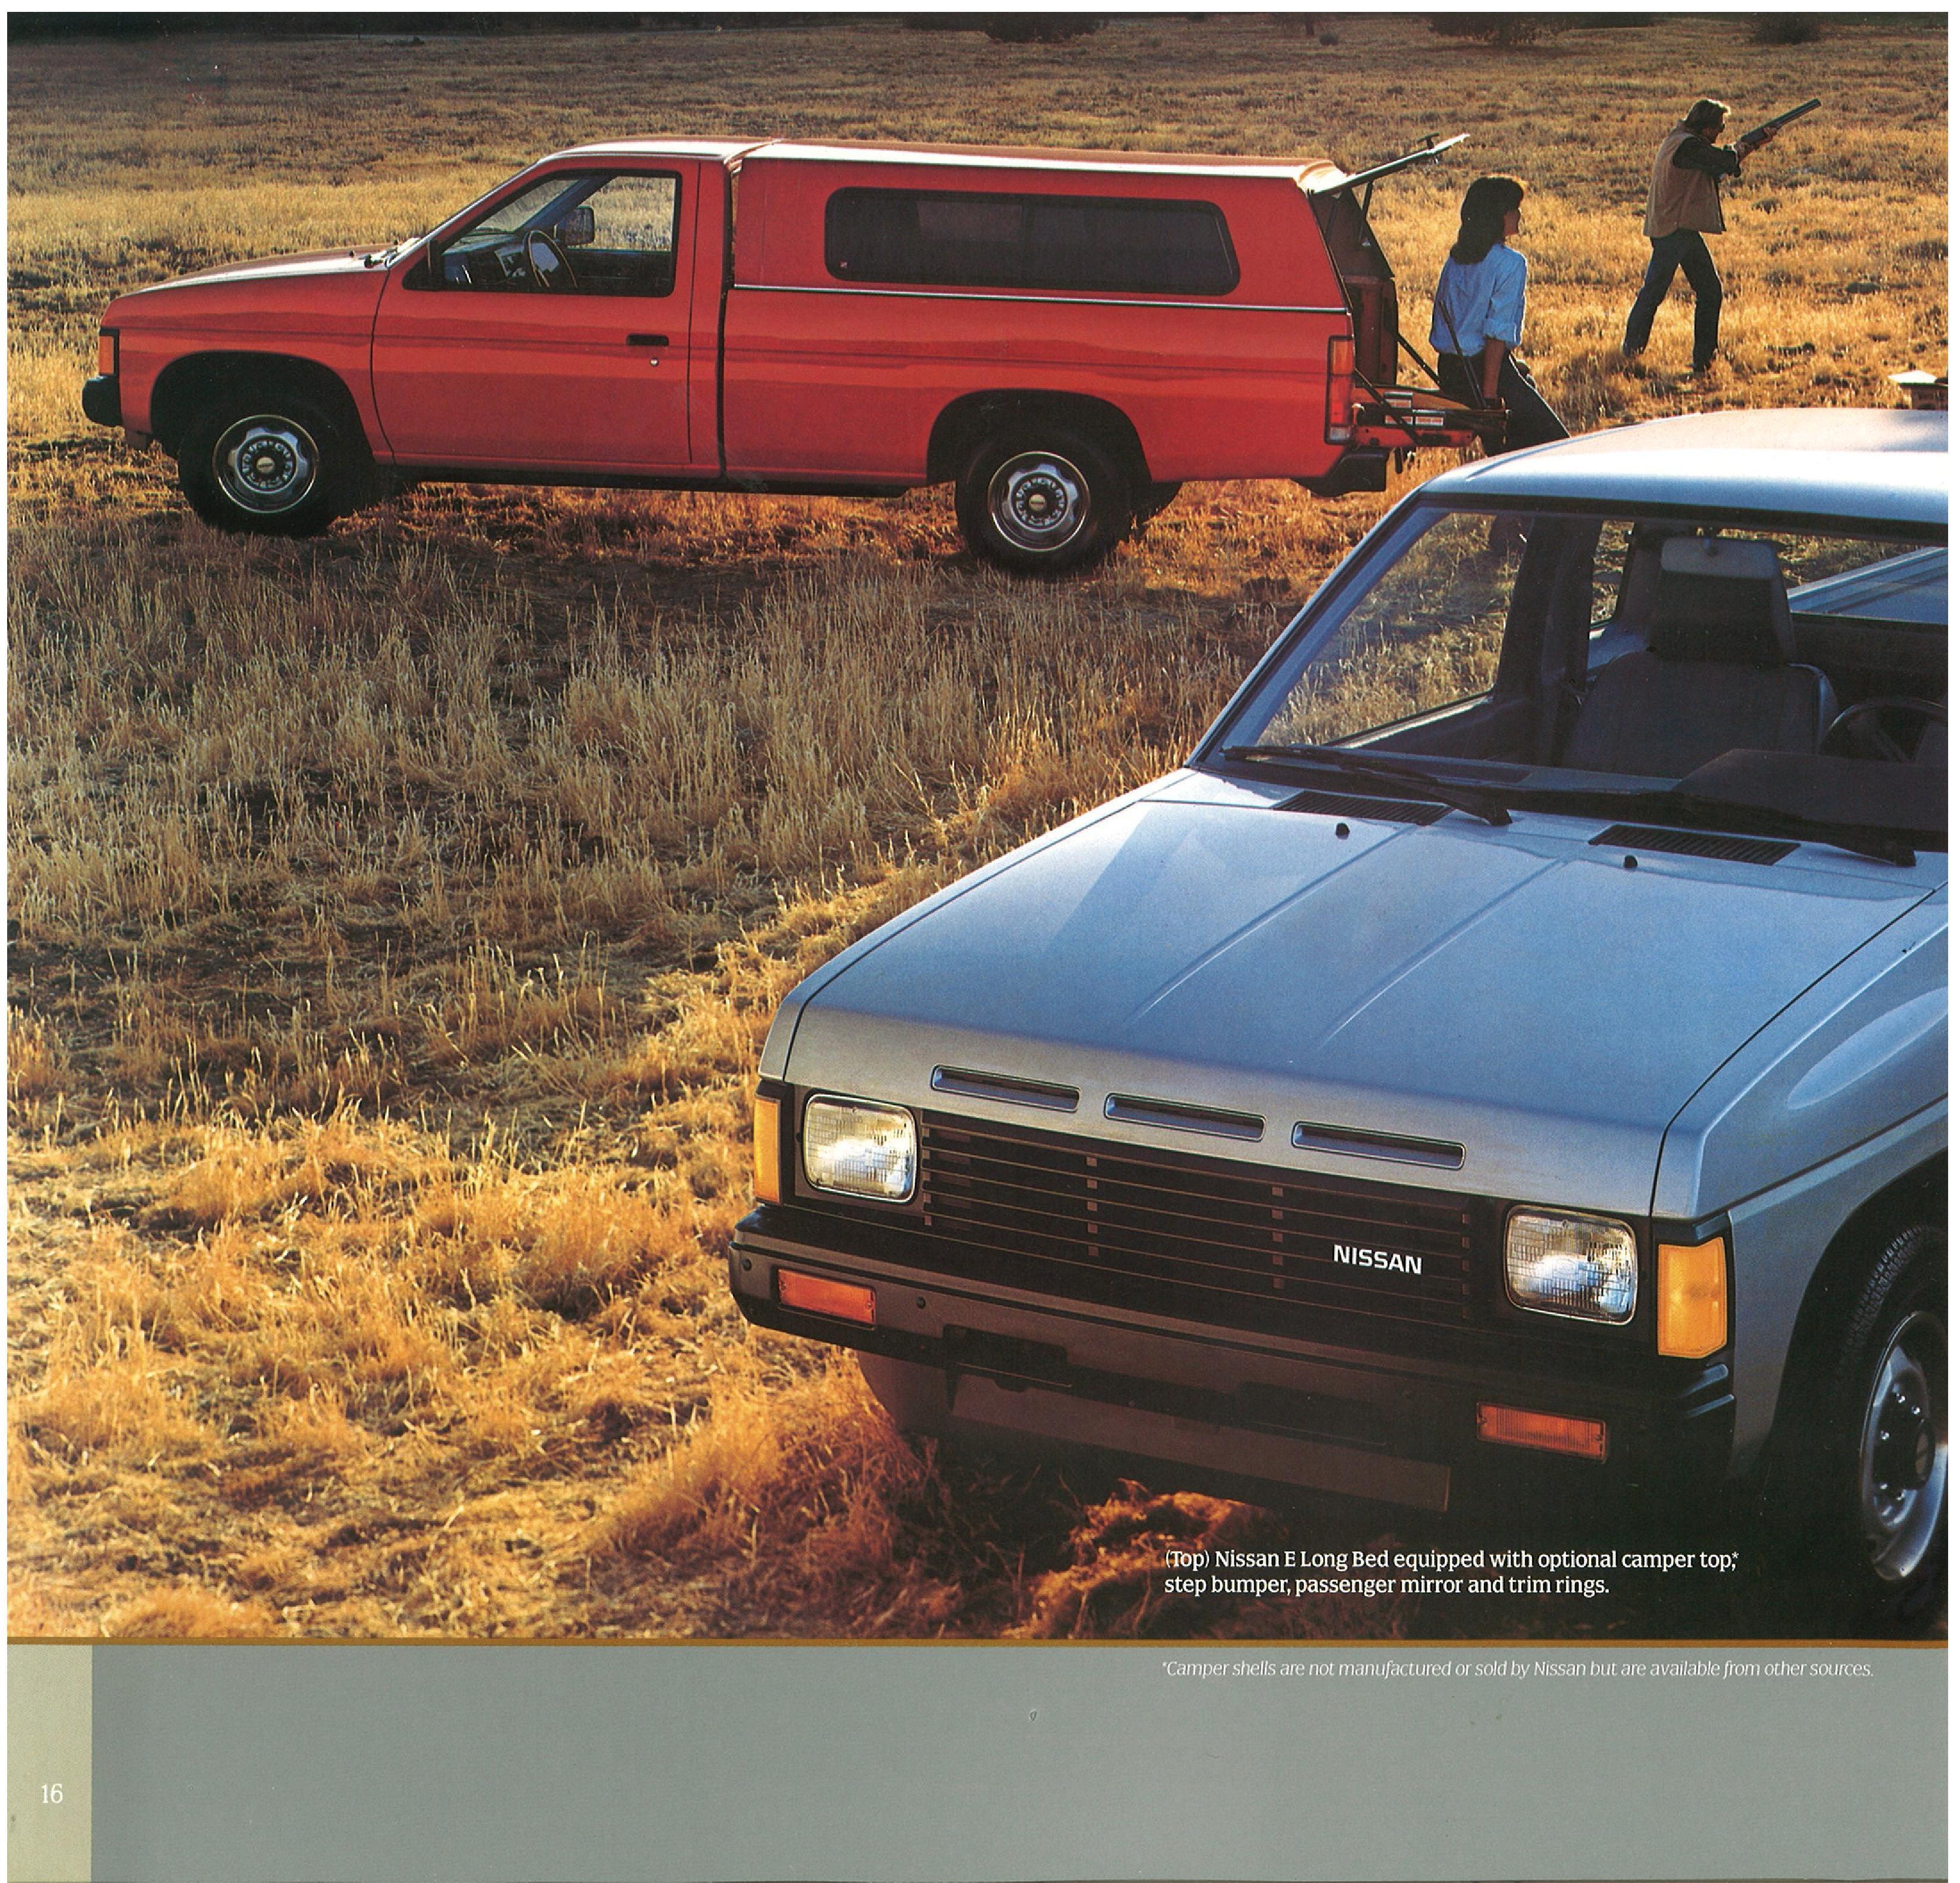 1987 Nissan Hard Truck D21 Dealer Brochure - US Market - NICOclub